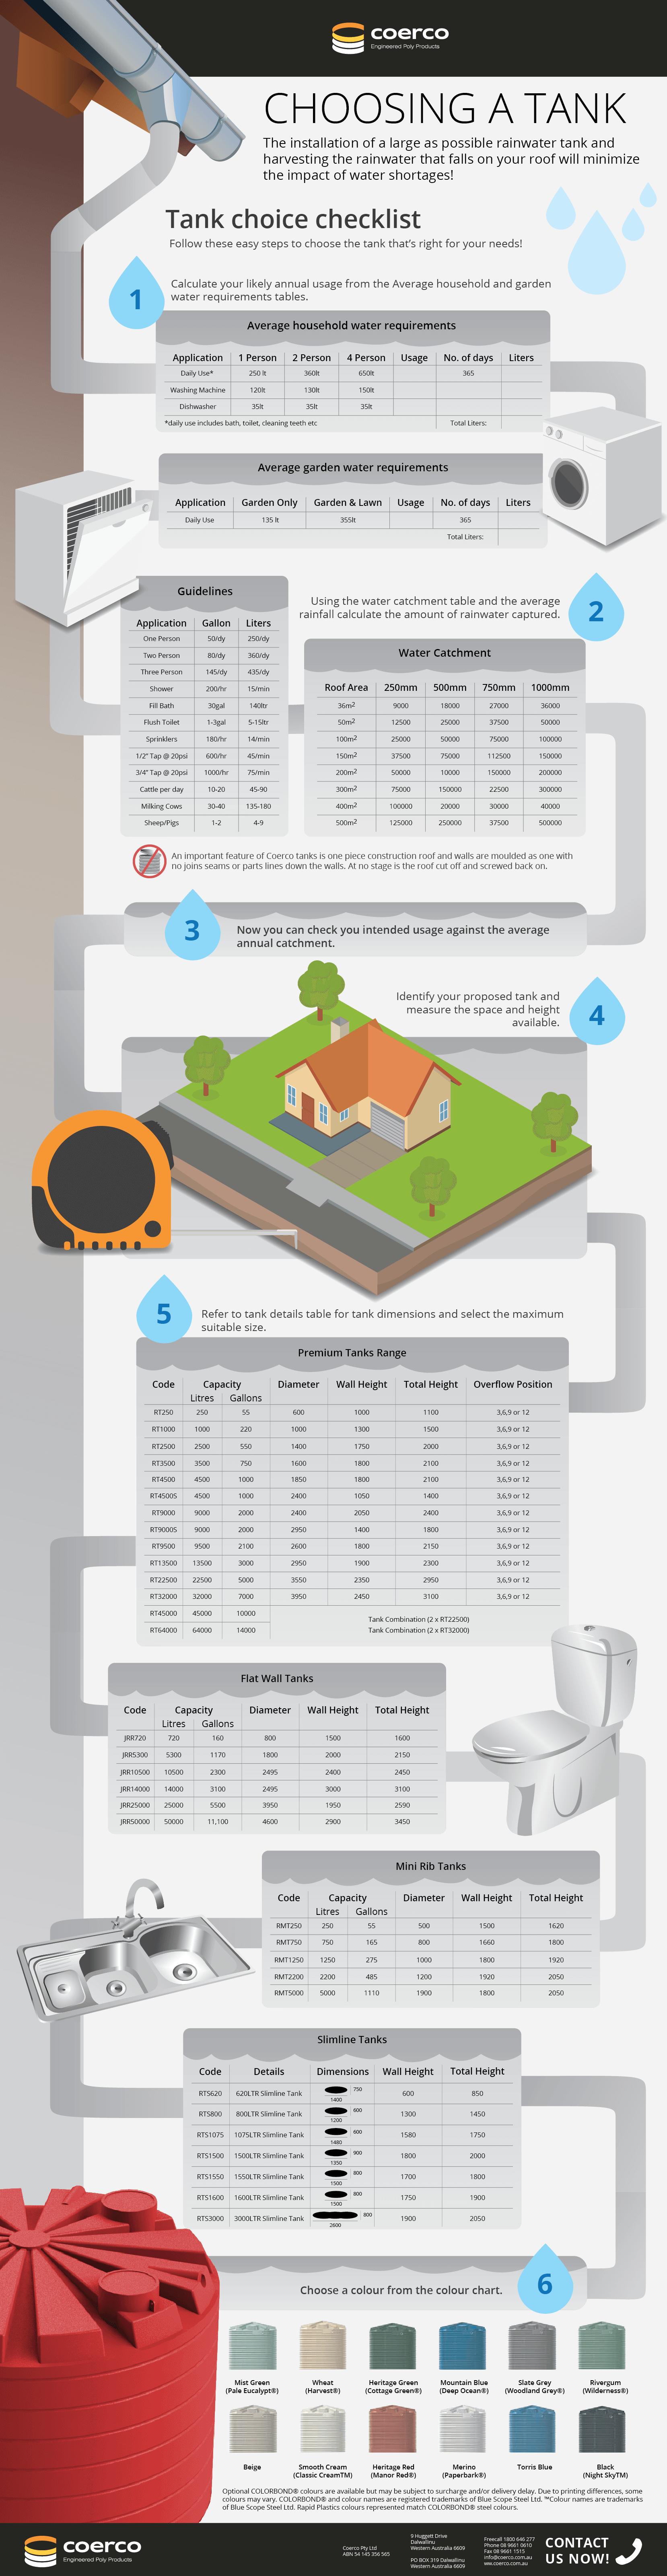 coerco-choosing-a-tank-infographic-plaza